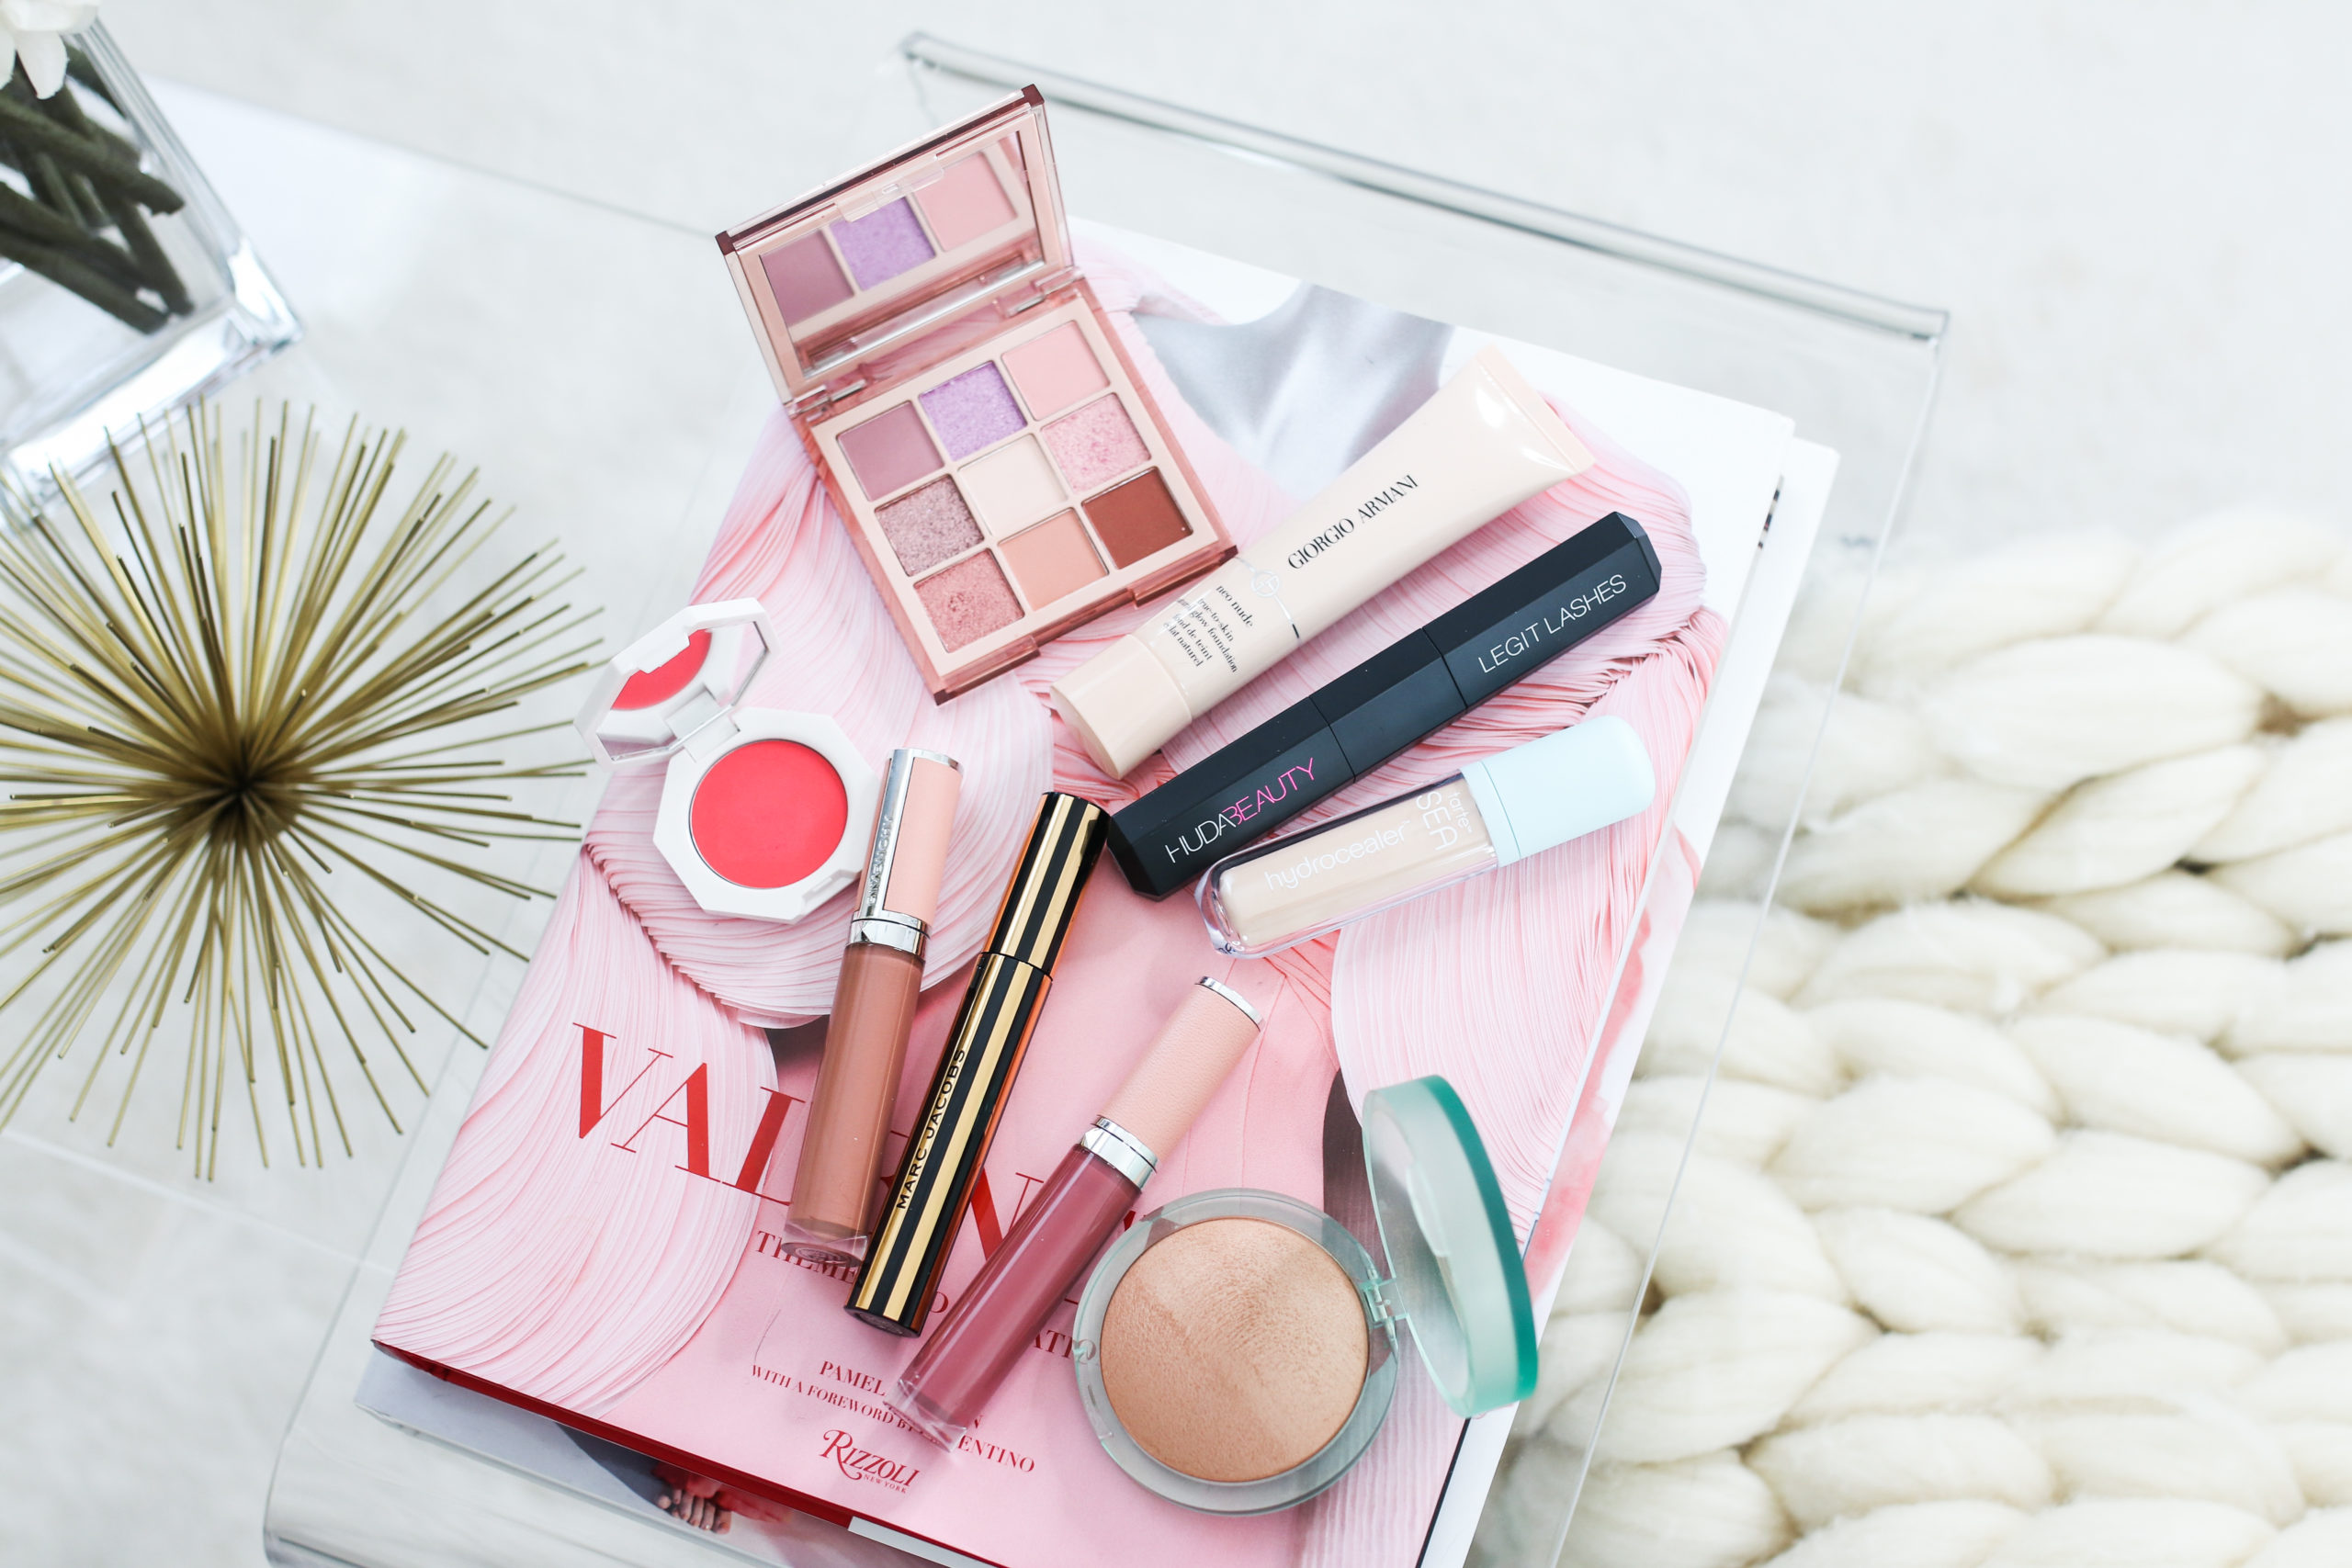 Testing Out New Makeup Armani Kosas Givenchy Huda Beauty And More Alittlebitetc